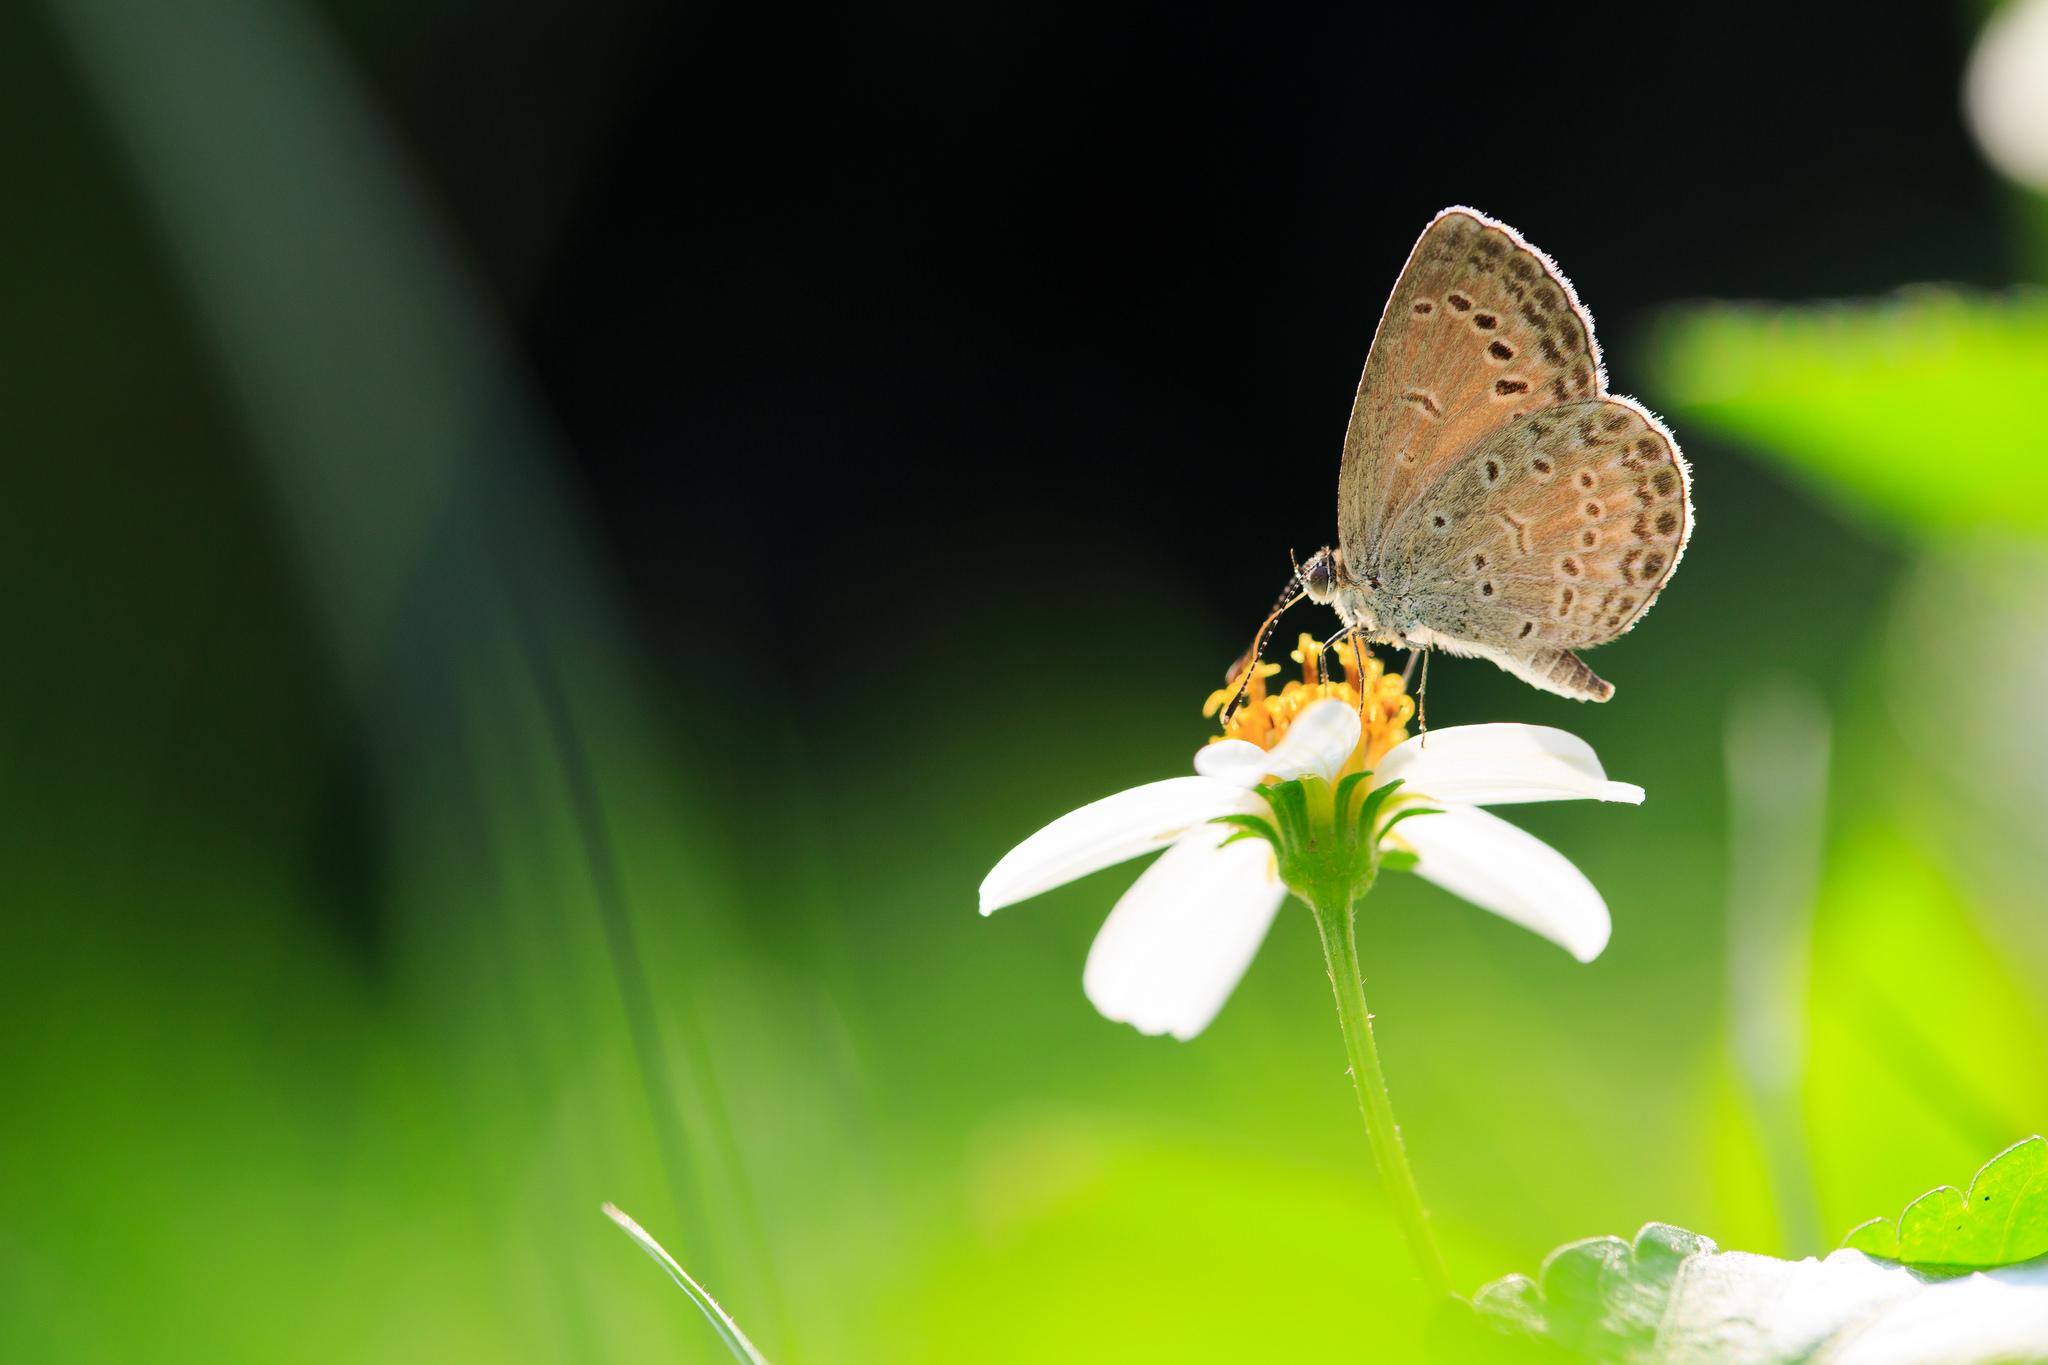 Mariposa en fondo verde - 2048x1365